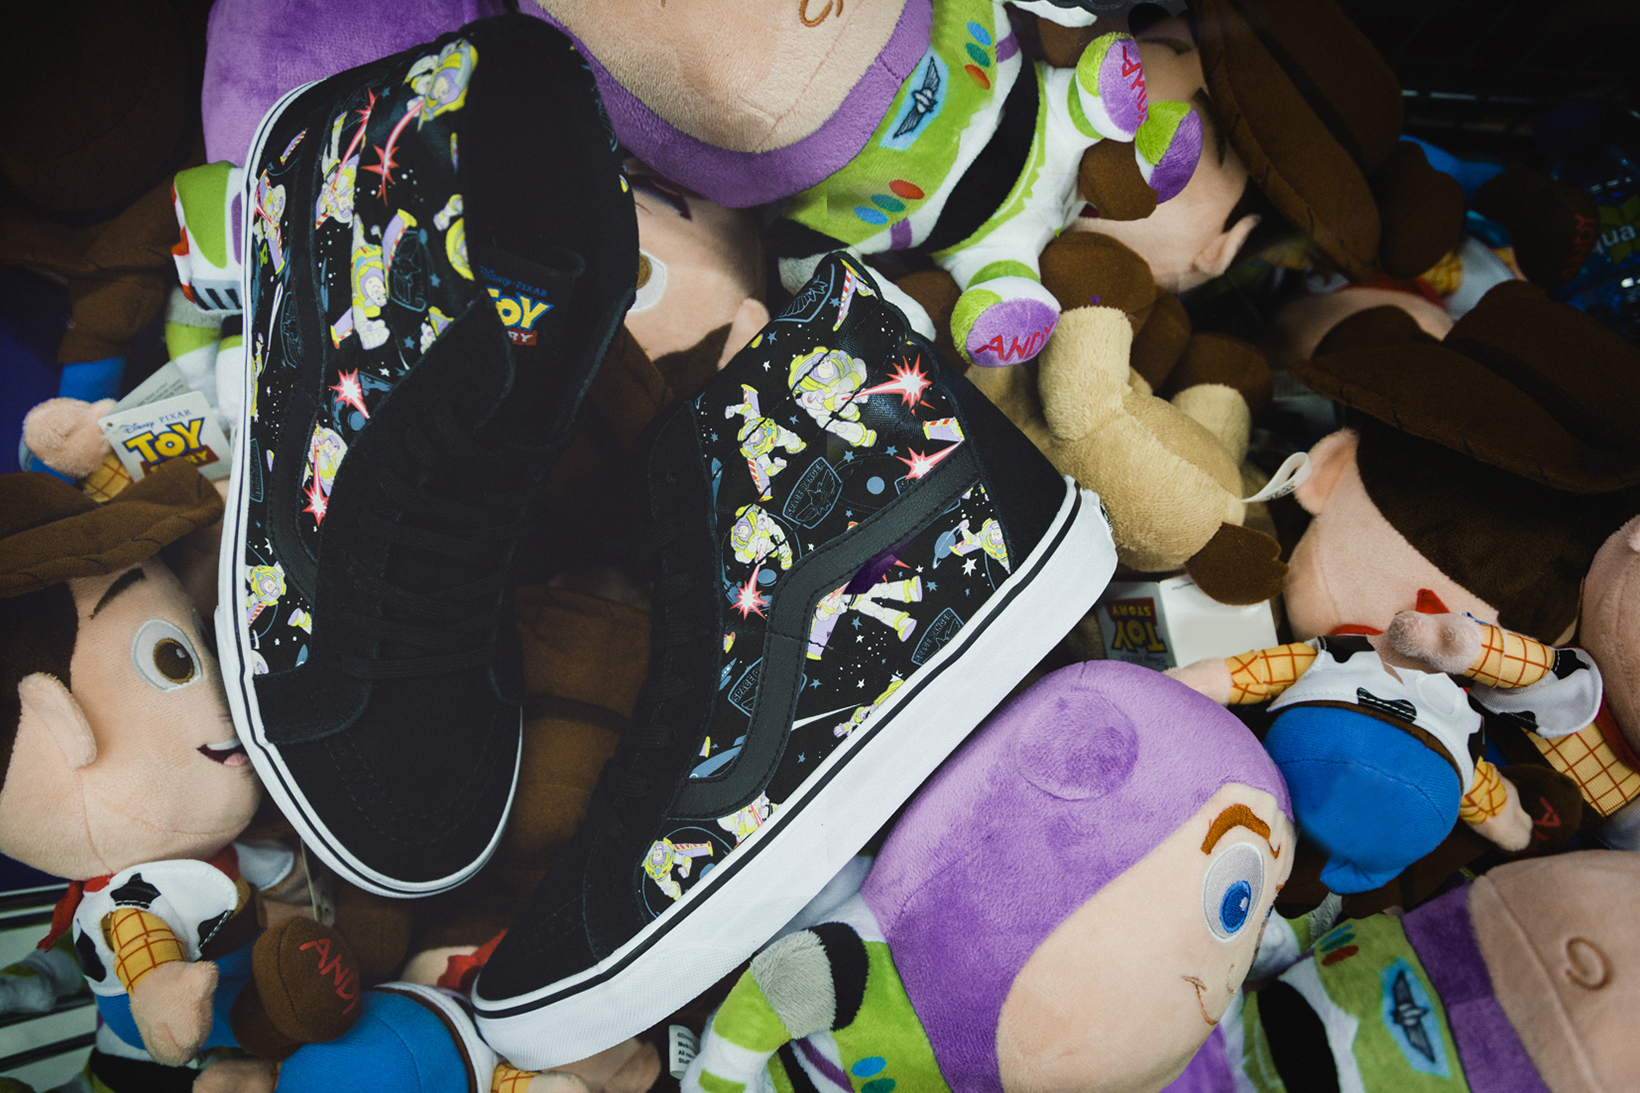 Toy Story Vans Sneakers Woody Buzz Lightyear Disney - 1765041